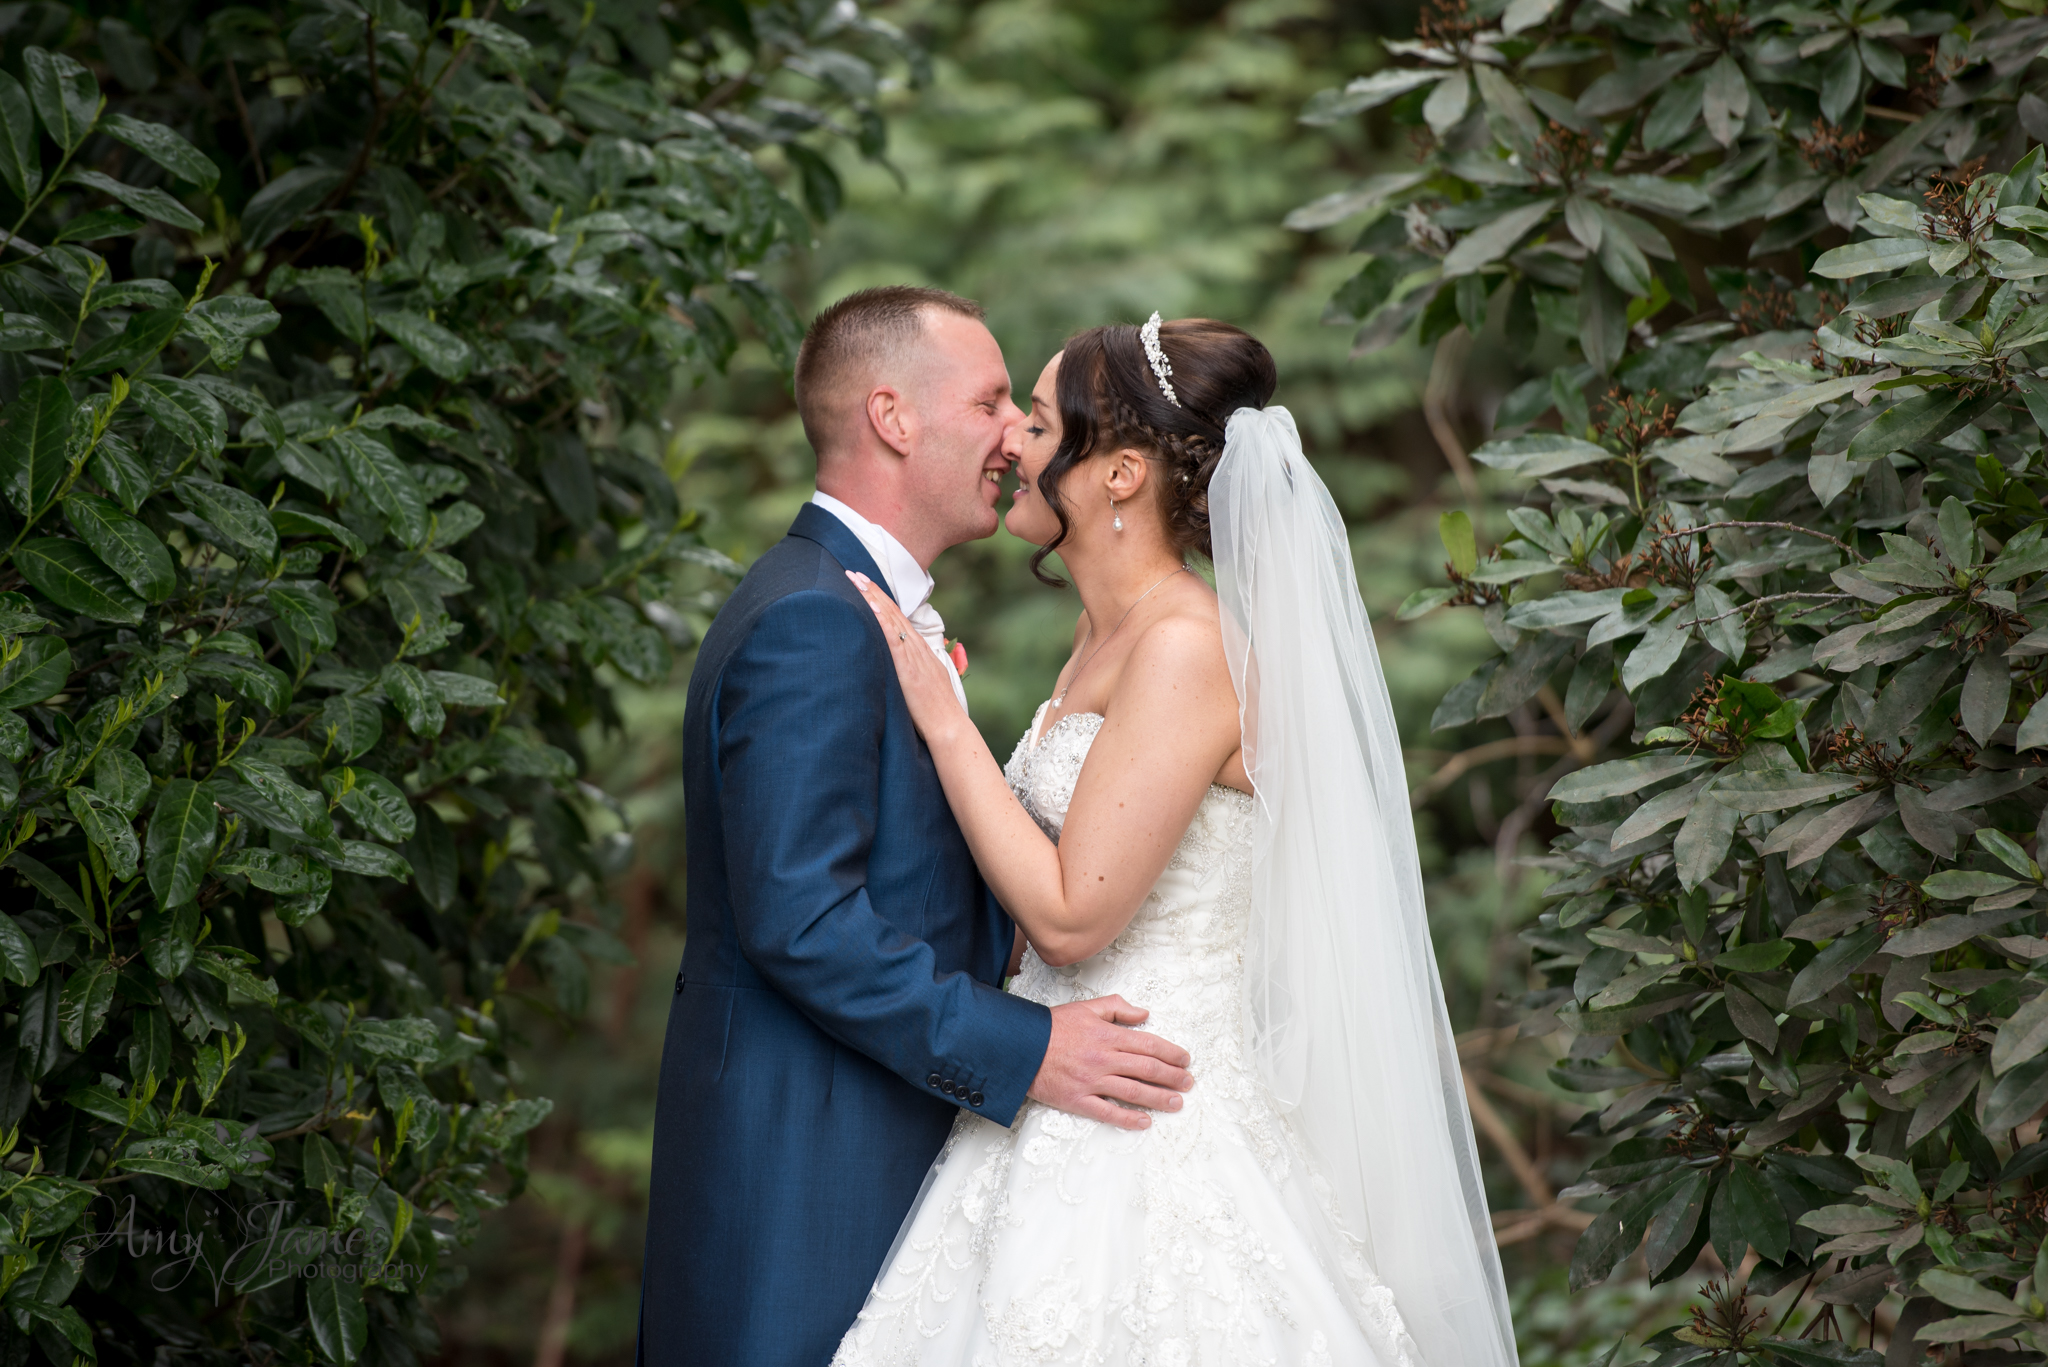 Fleet wedding photographer // Frimley Hall Hotel wedding // Hampshire wedding photographer